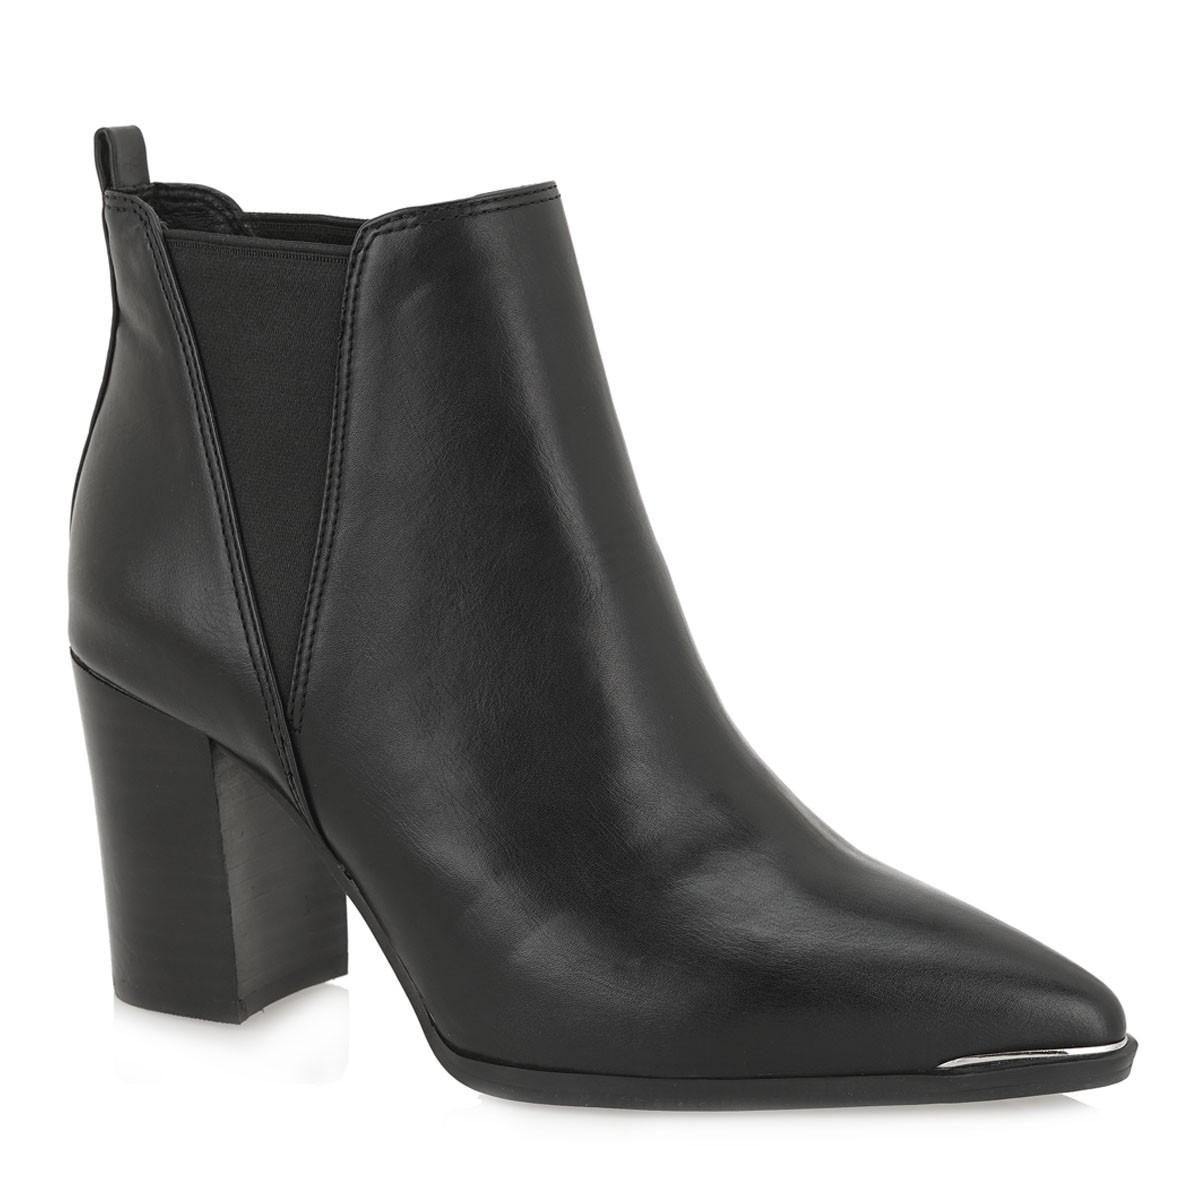 Exe Shoes Γυναικεία Μποτάκια AMANDA-090 Μαύρo J3700090400107